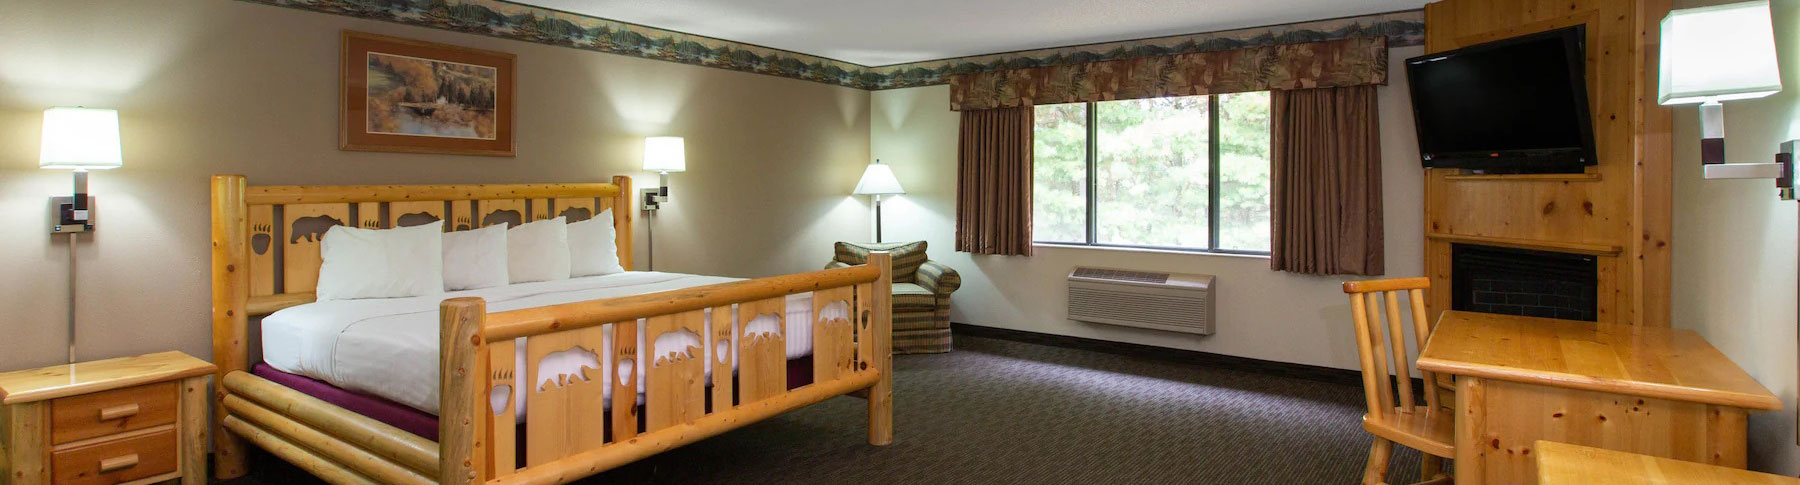 Cobblestone Hotel & Suites Ladysmith